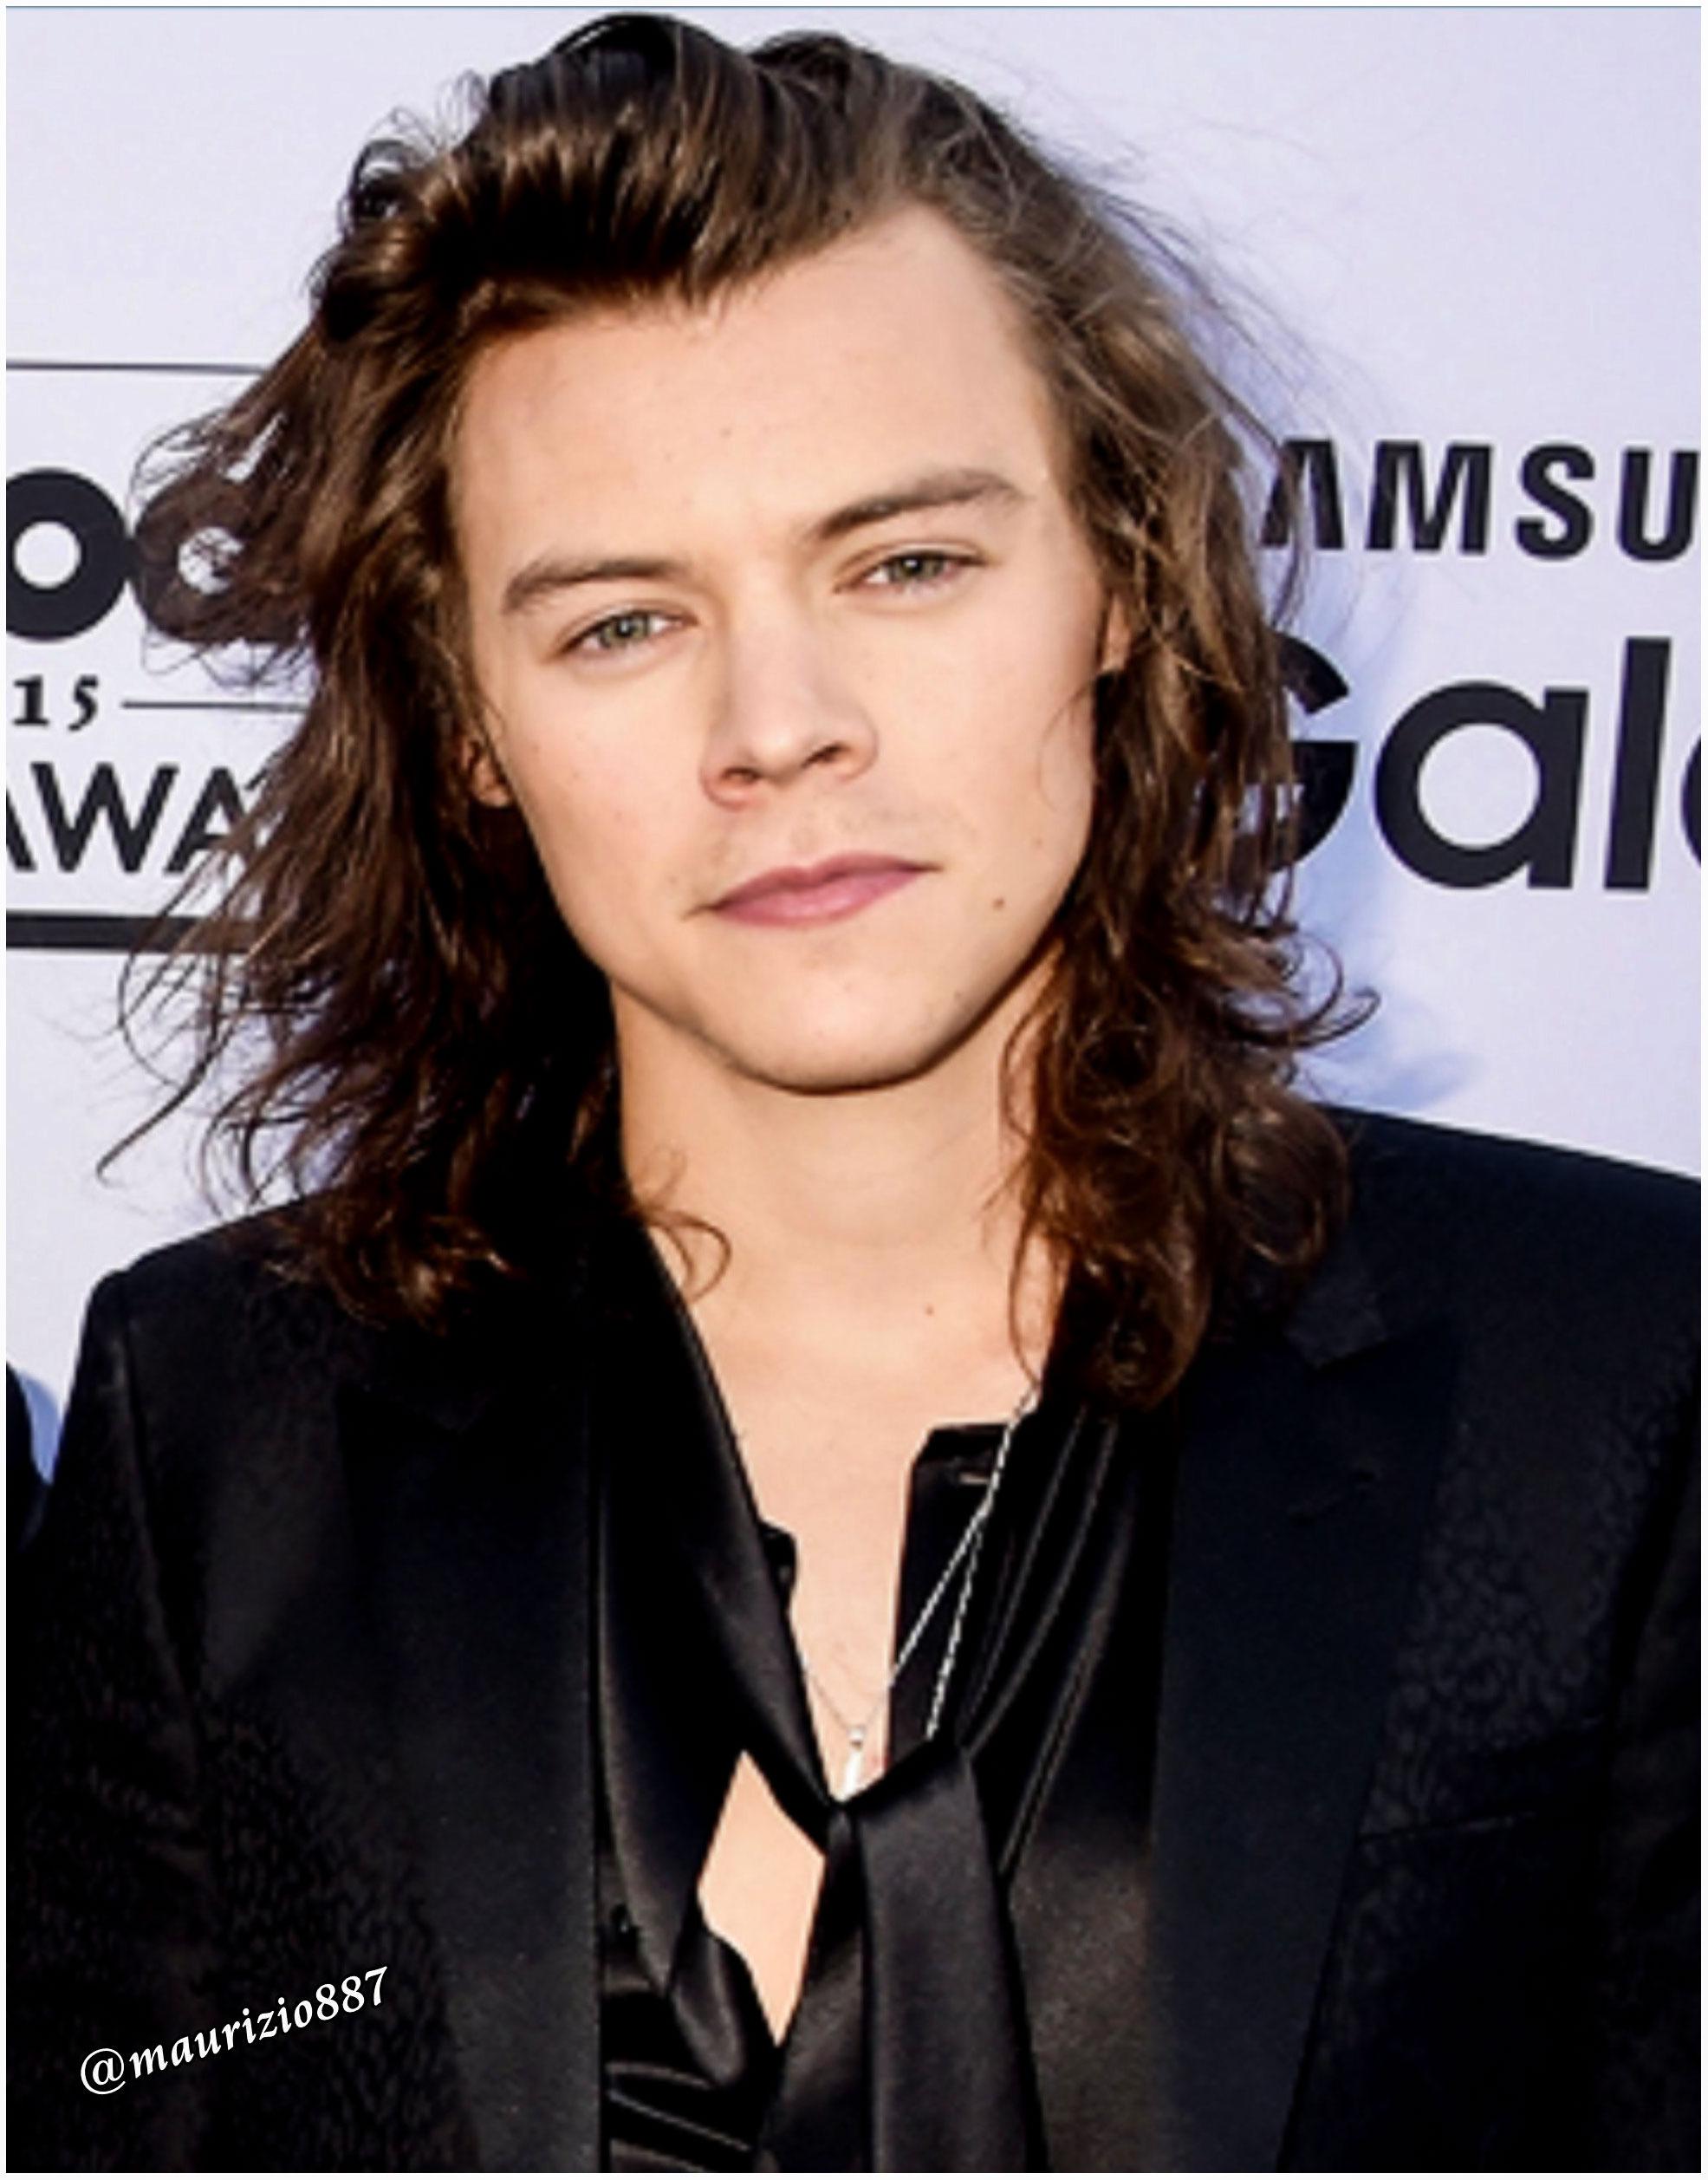 Harry Styles,Billboard Music Awards 2015